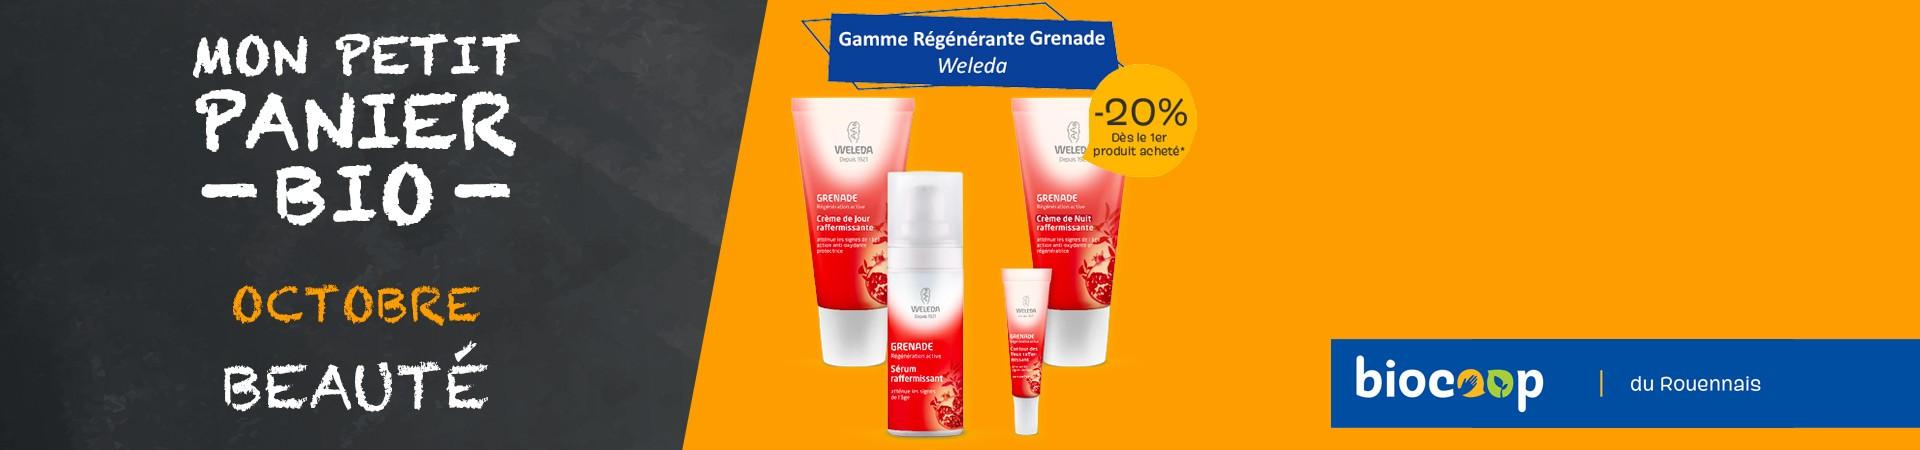 Gamme Régénérante Grenade Weleda